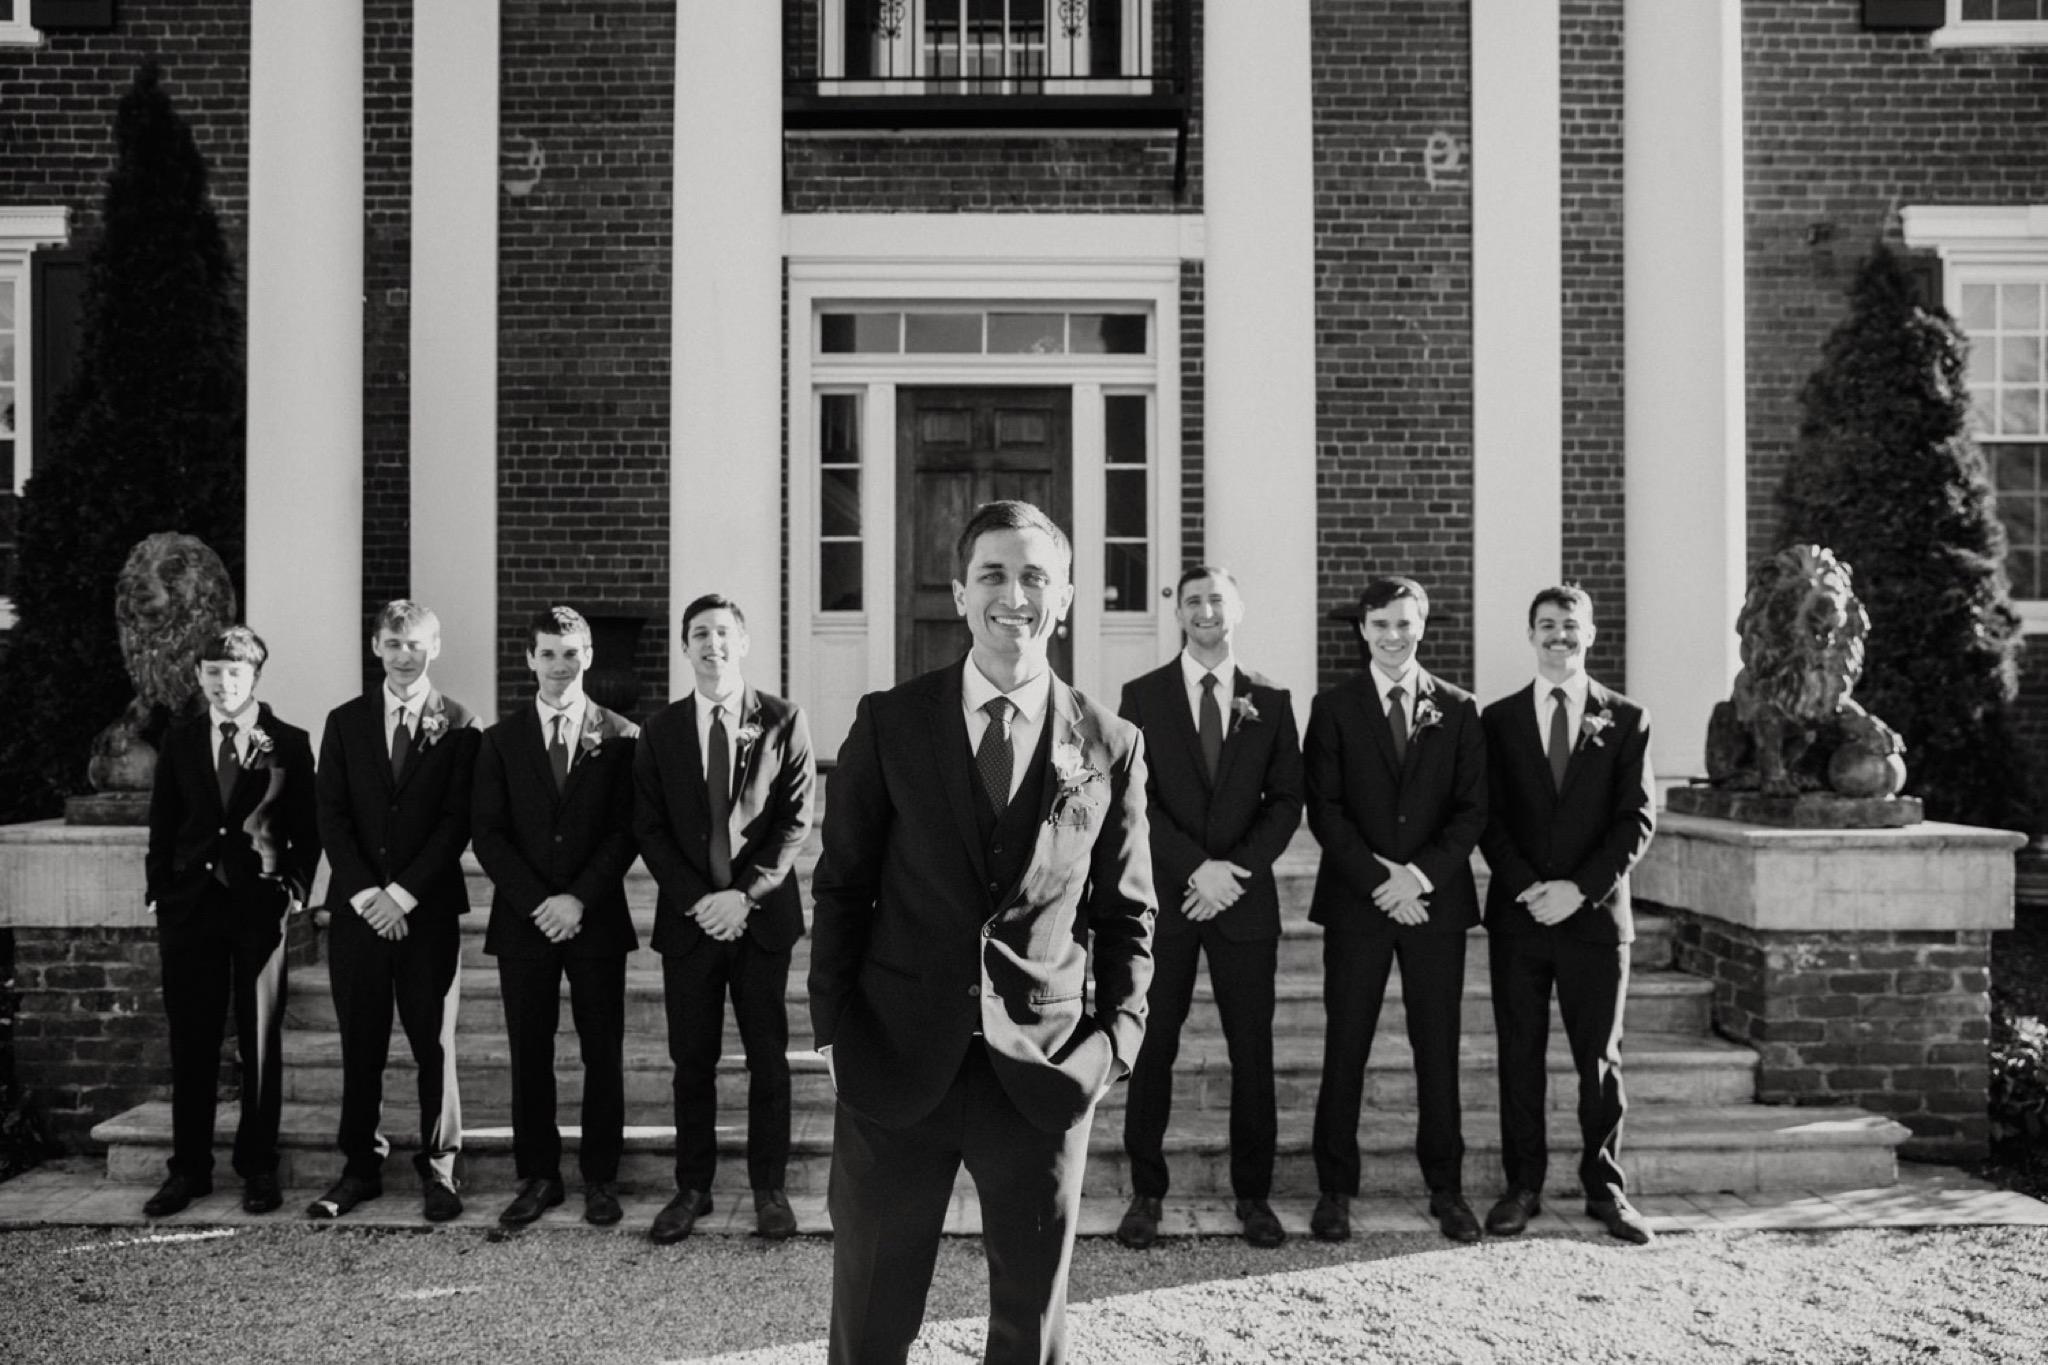 56_West Manor Estate Weddings - Pat Cori Photography-117_groomsmen_VirginiaWeddingPhotographer_WestManorEstate_Portraits_Wedding.jpg